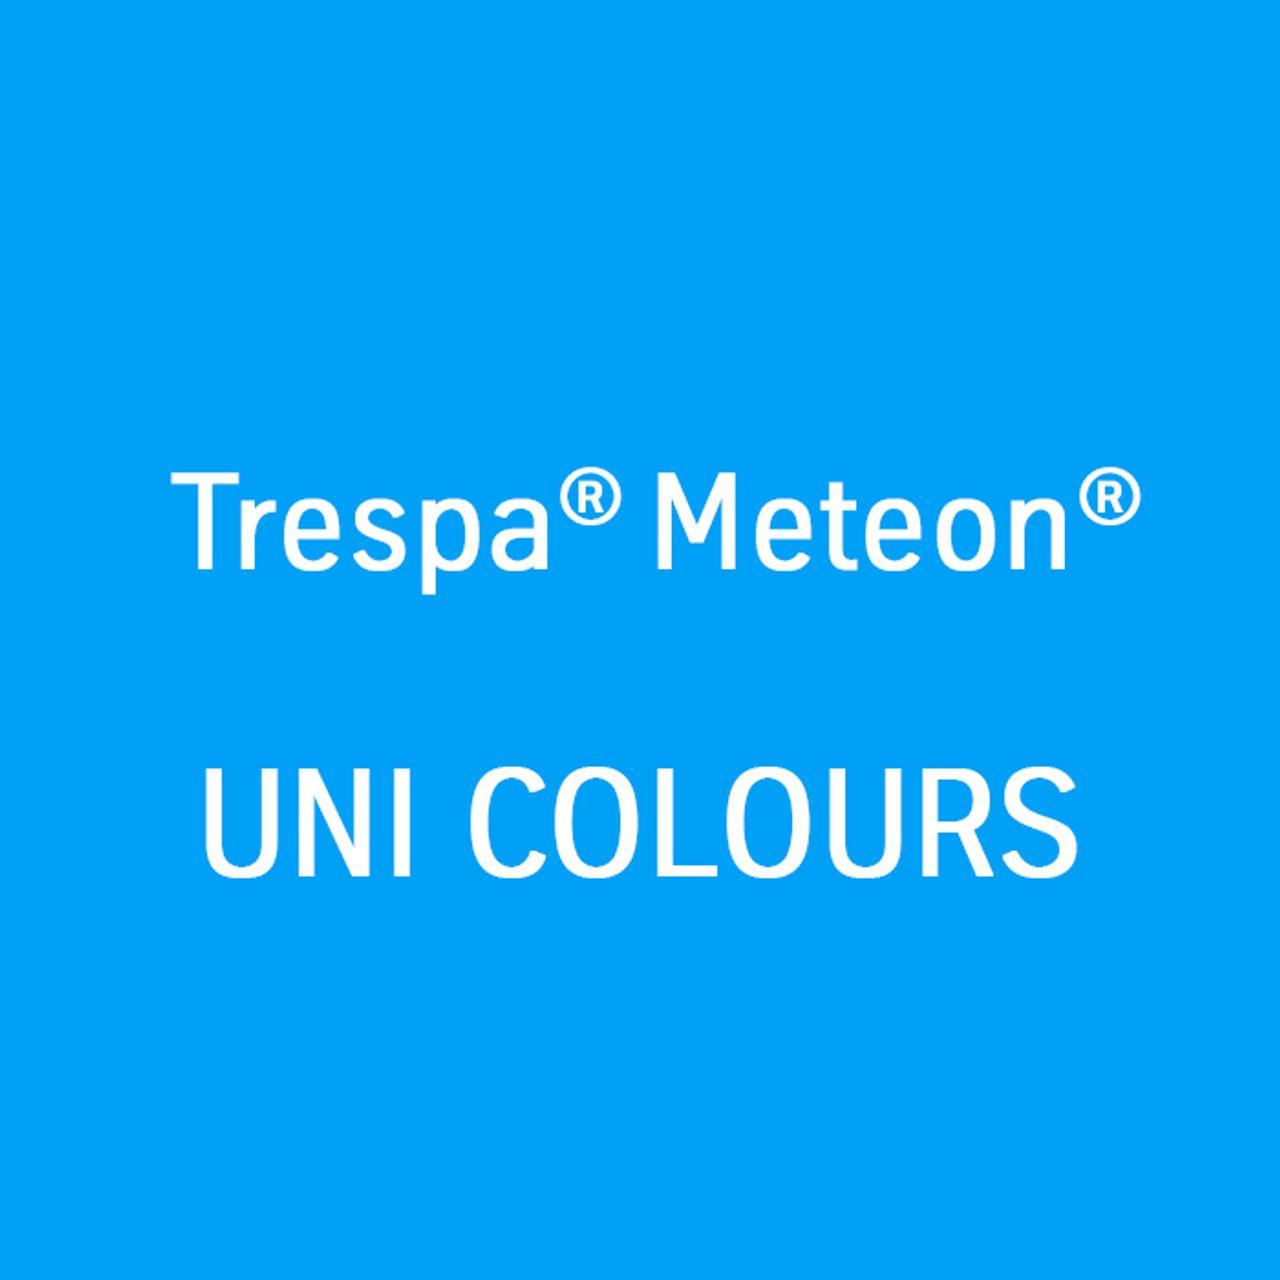 Trespa® Meteon® UNI COLOURS